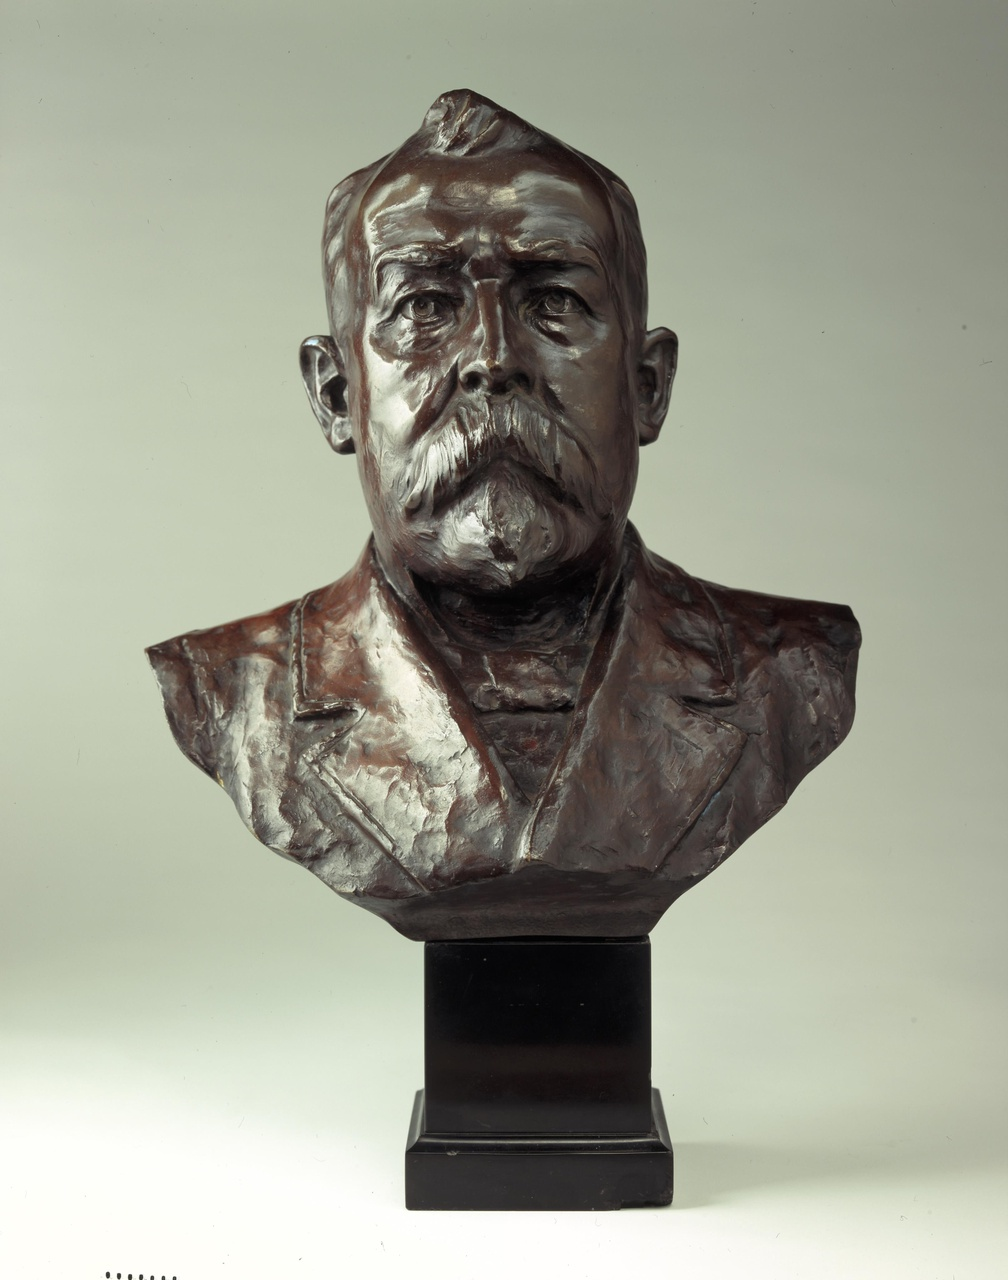 Borstbeeld van Louis Smulders (1839-1908)